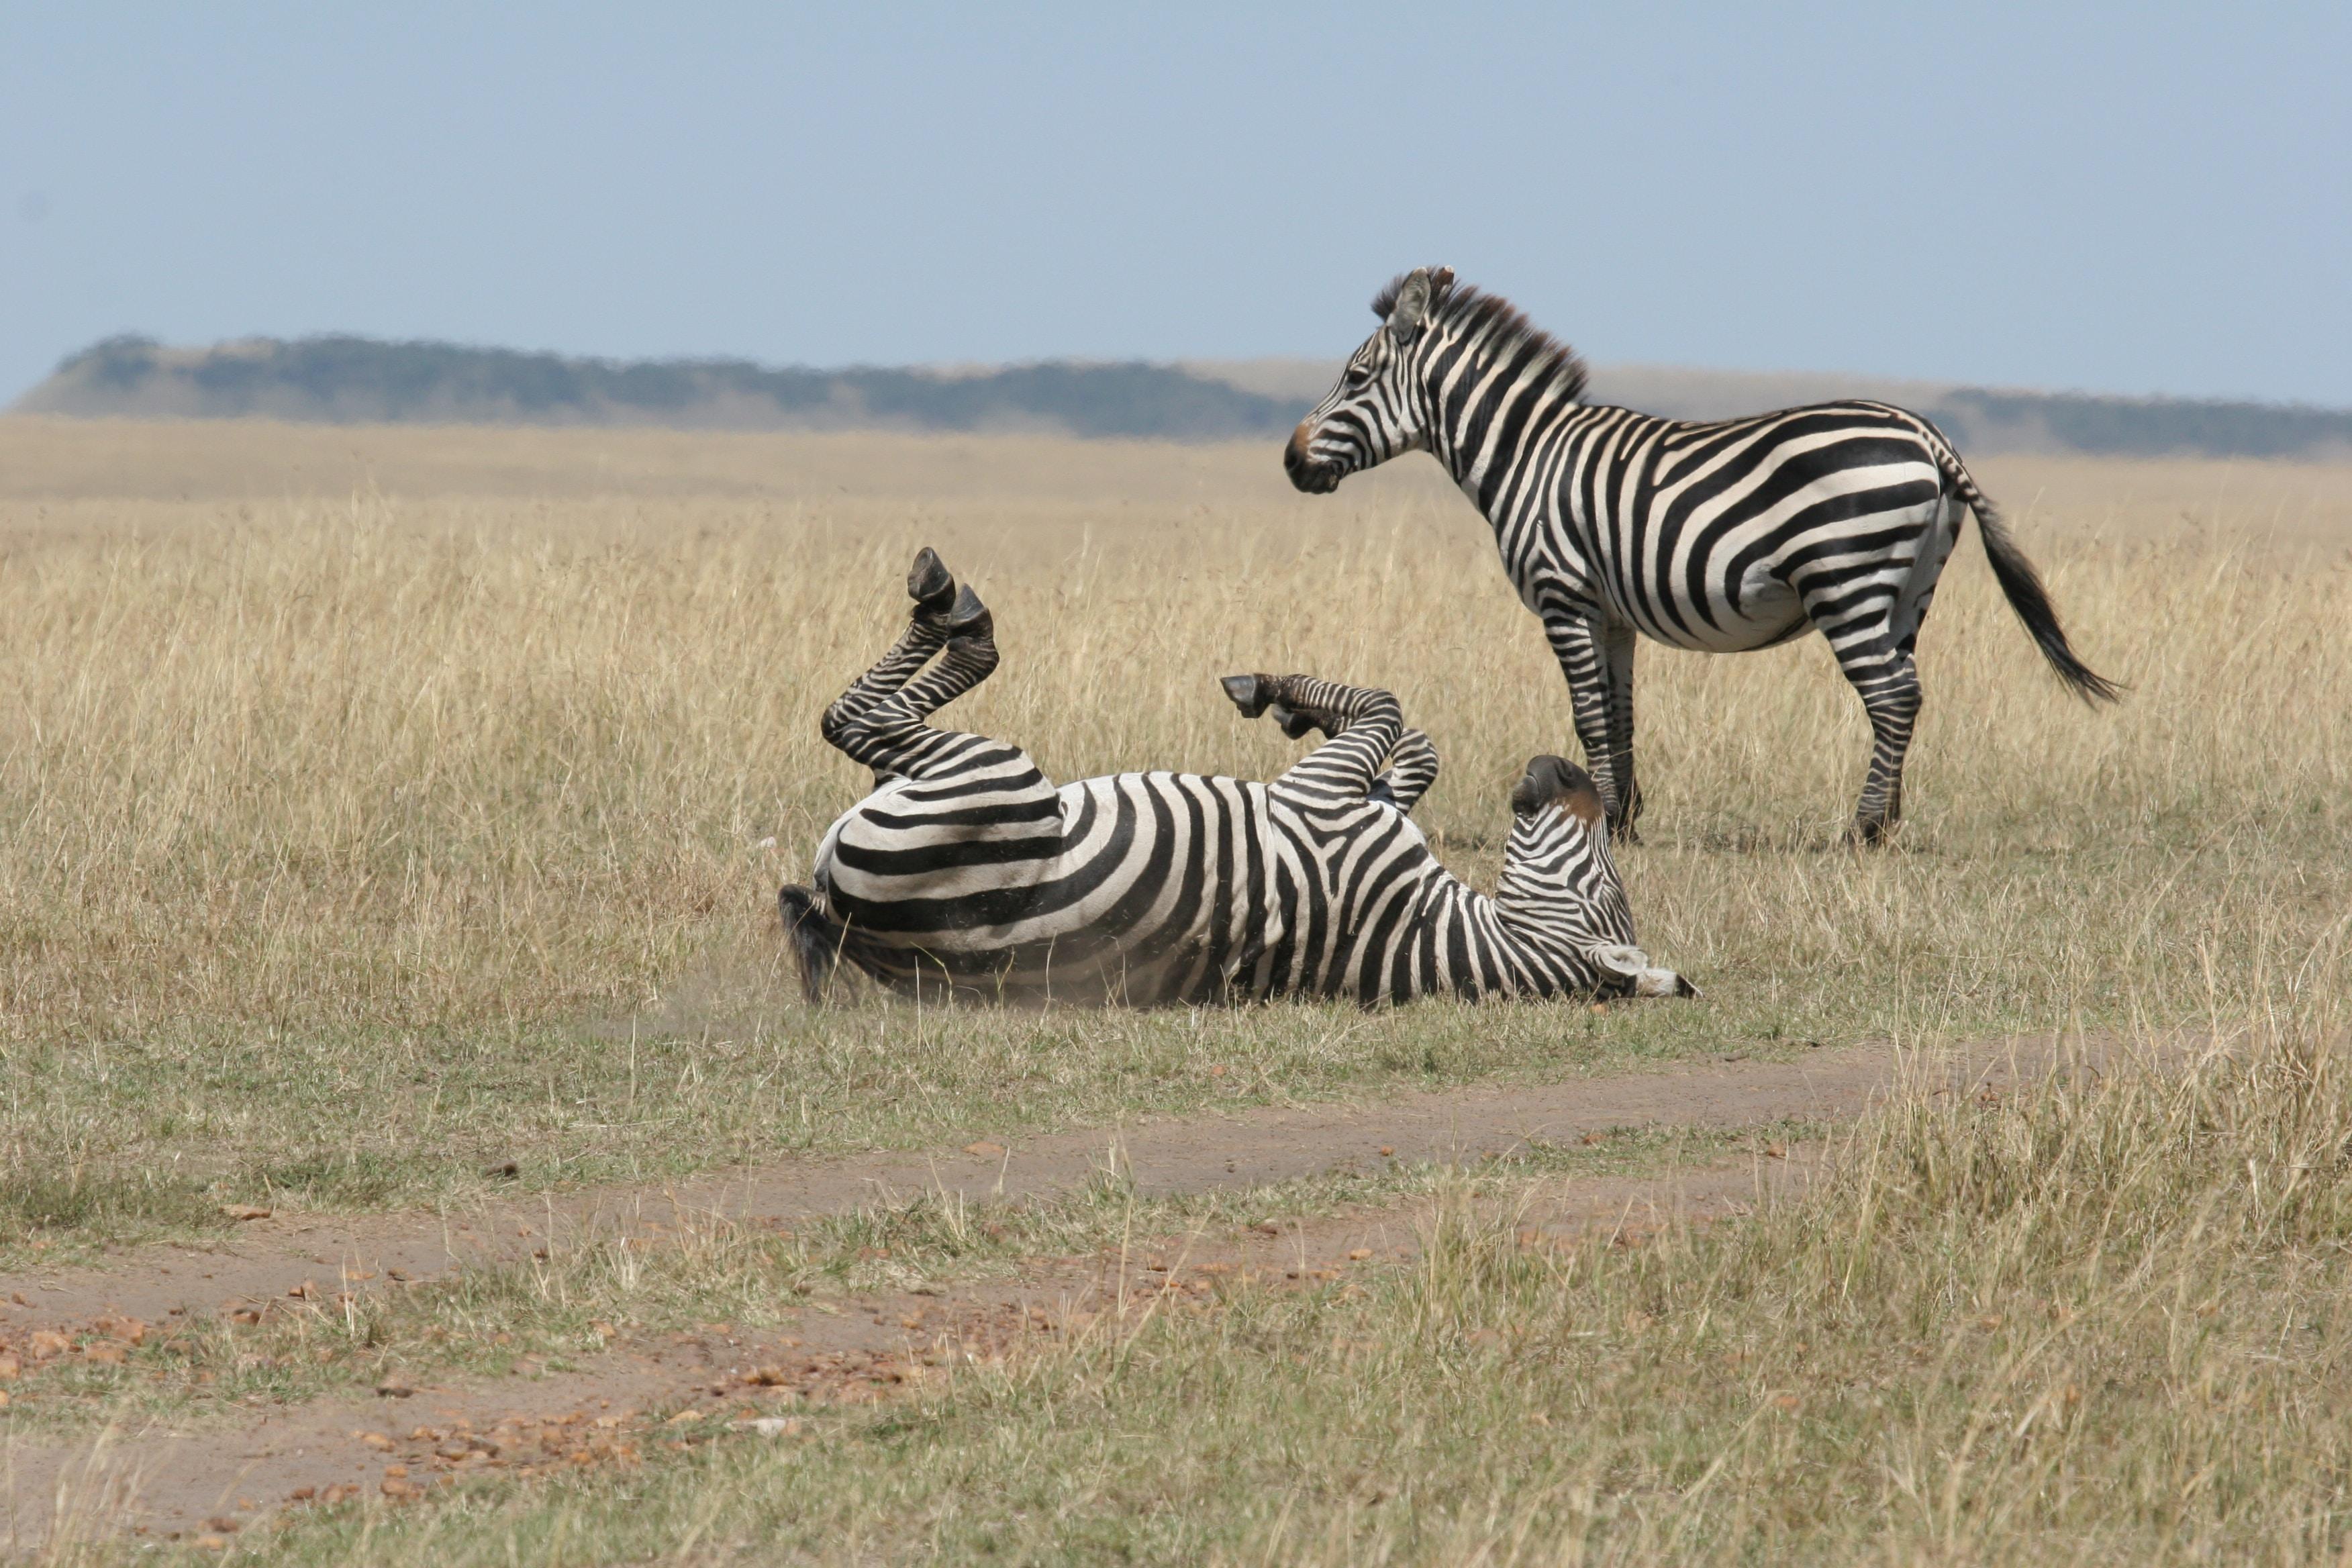 two zebras in the wildlife